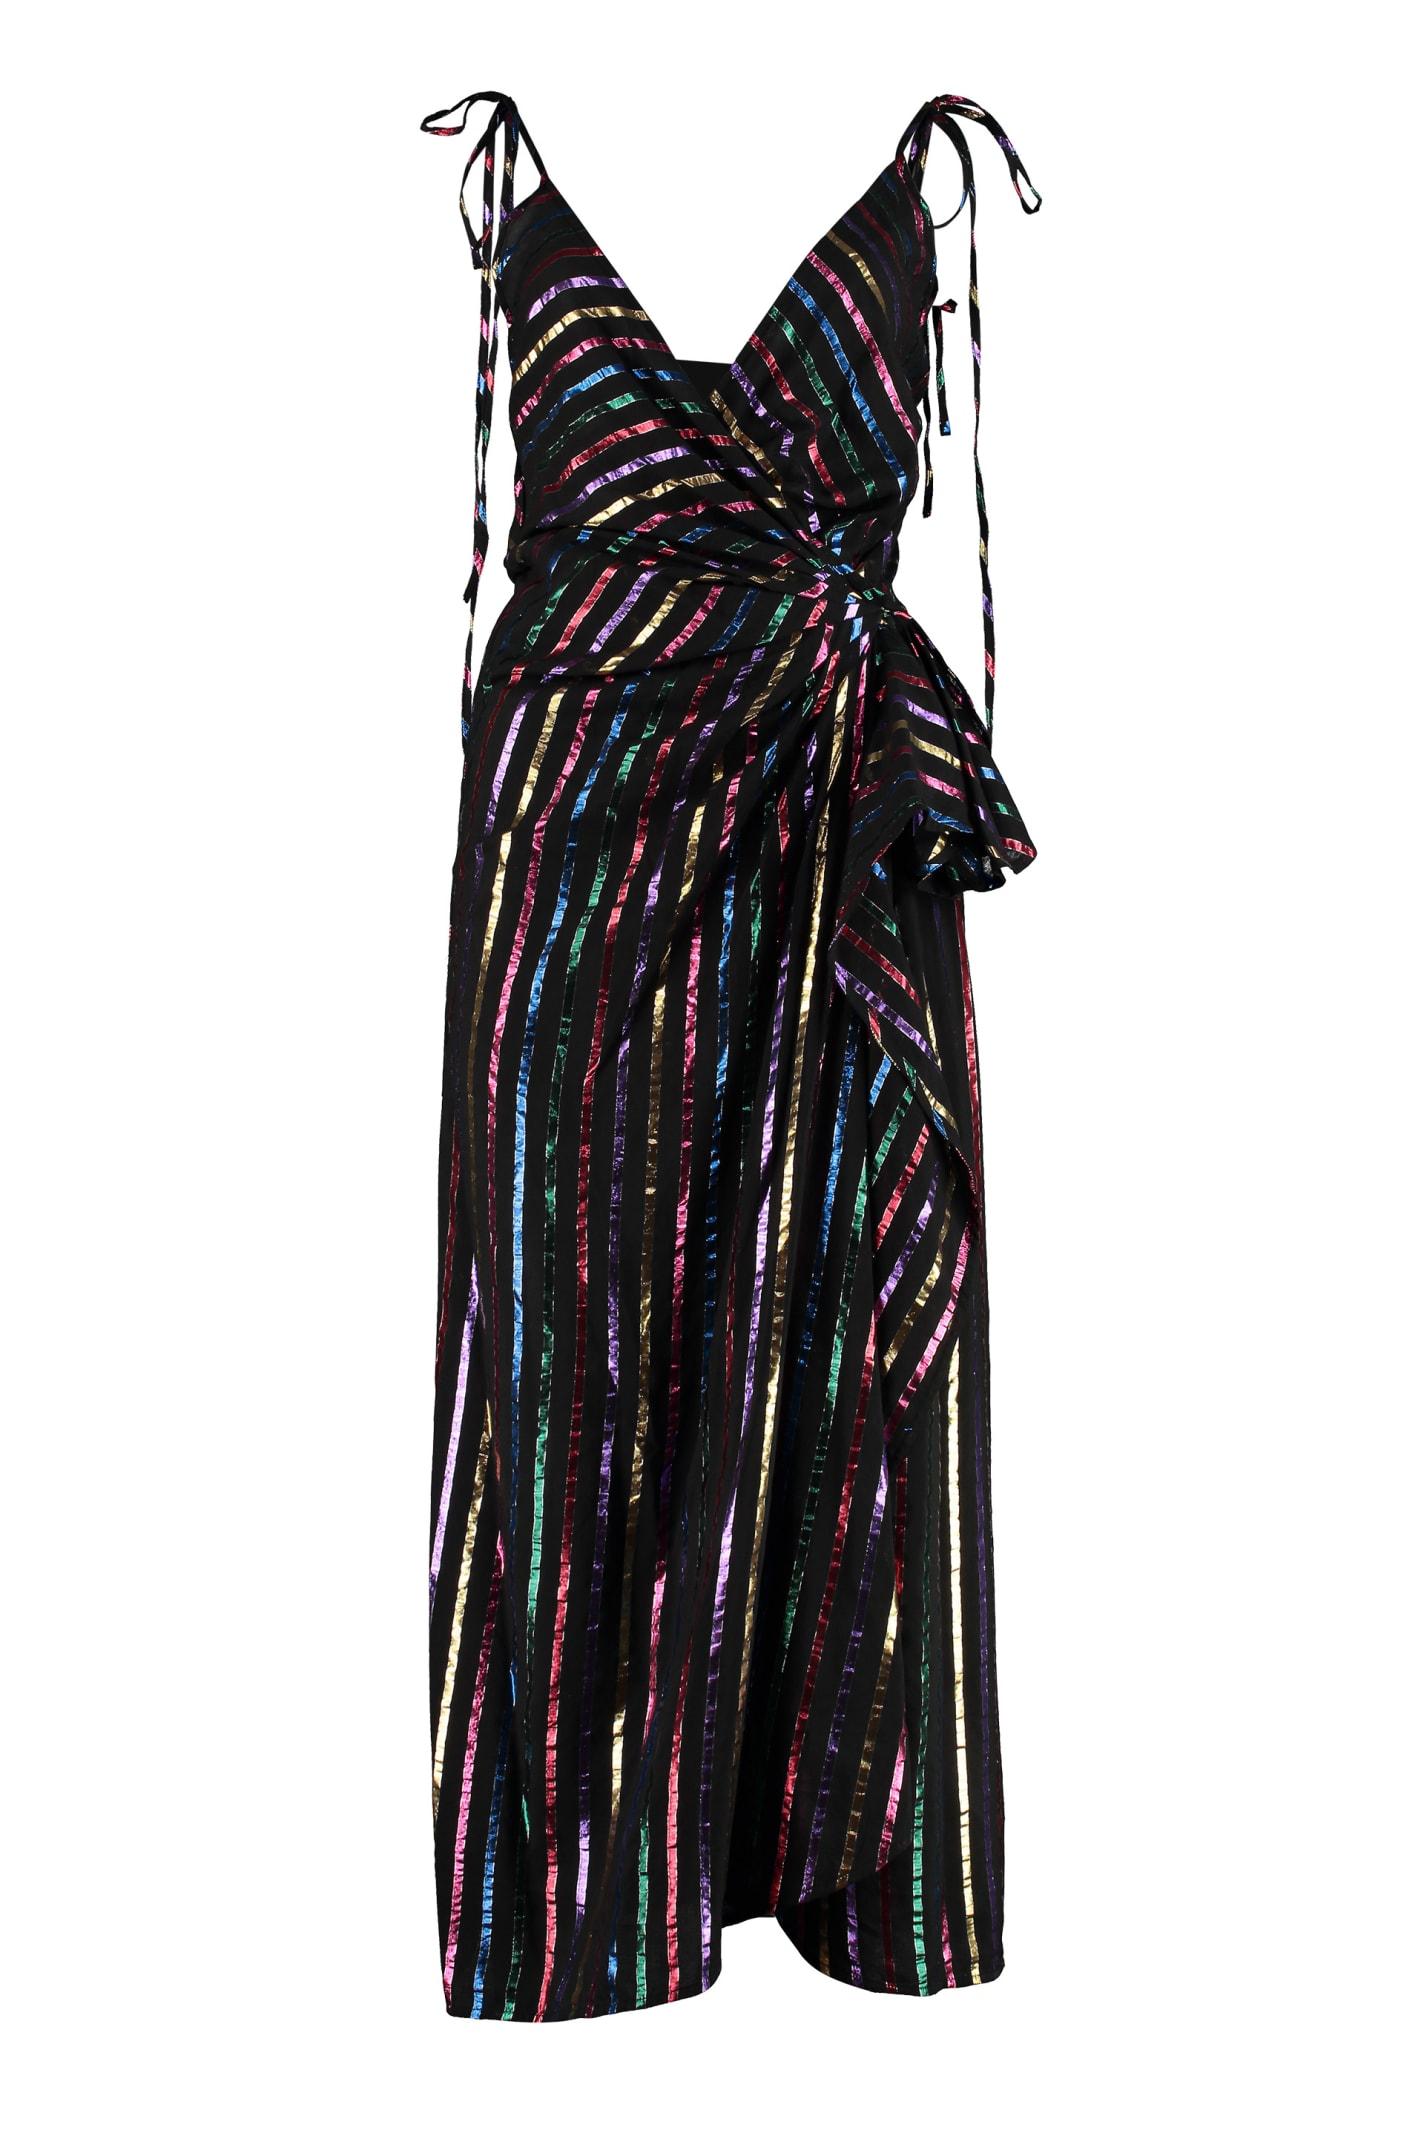 The Attico Wrap-dress